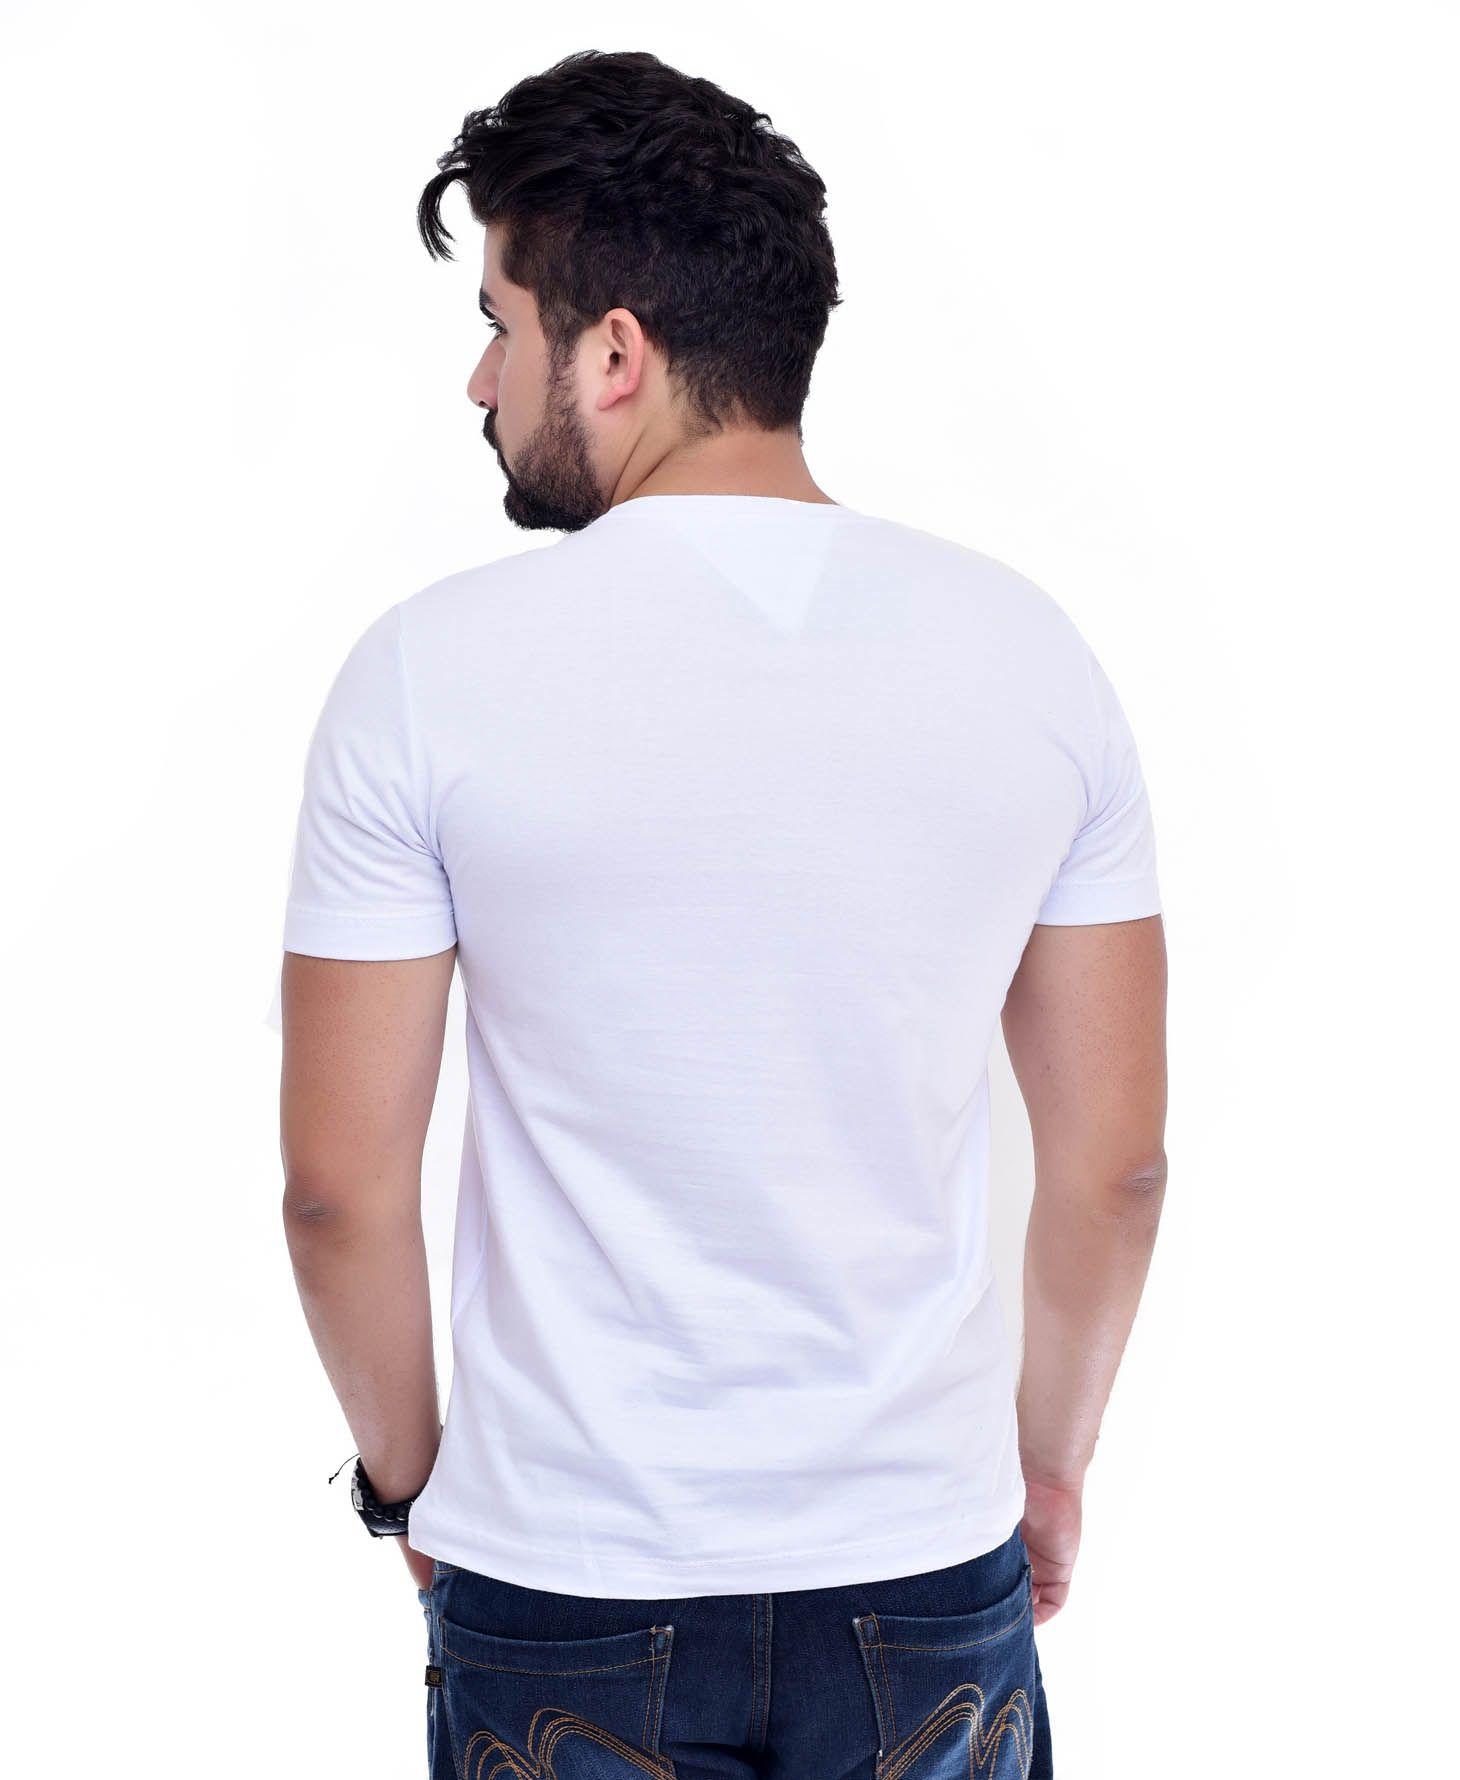 Camiseta Bolso TH Branco / Marinho  - Ca Brasileira